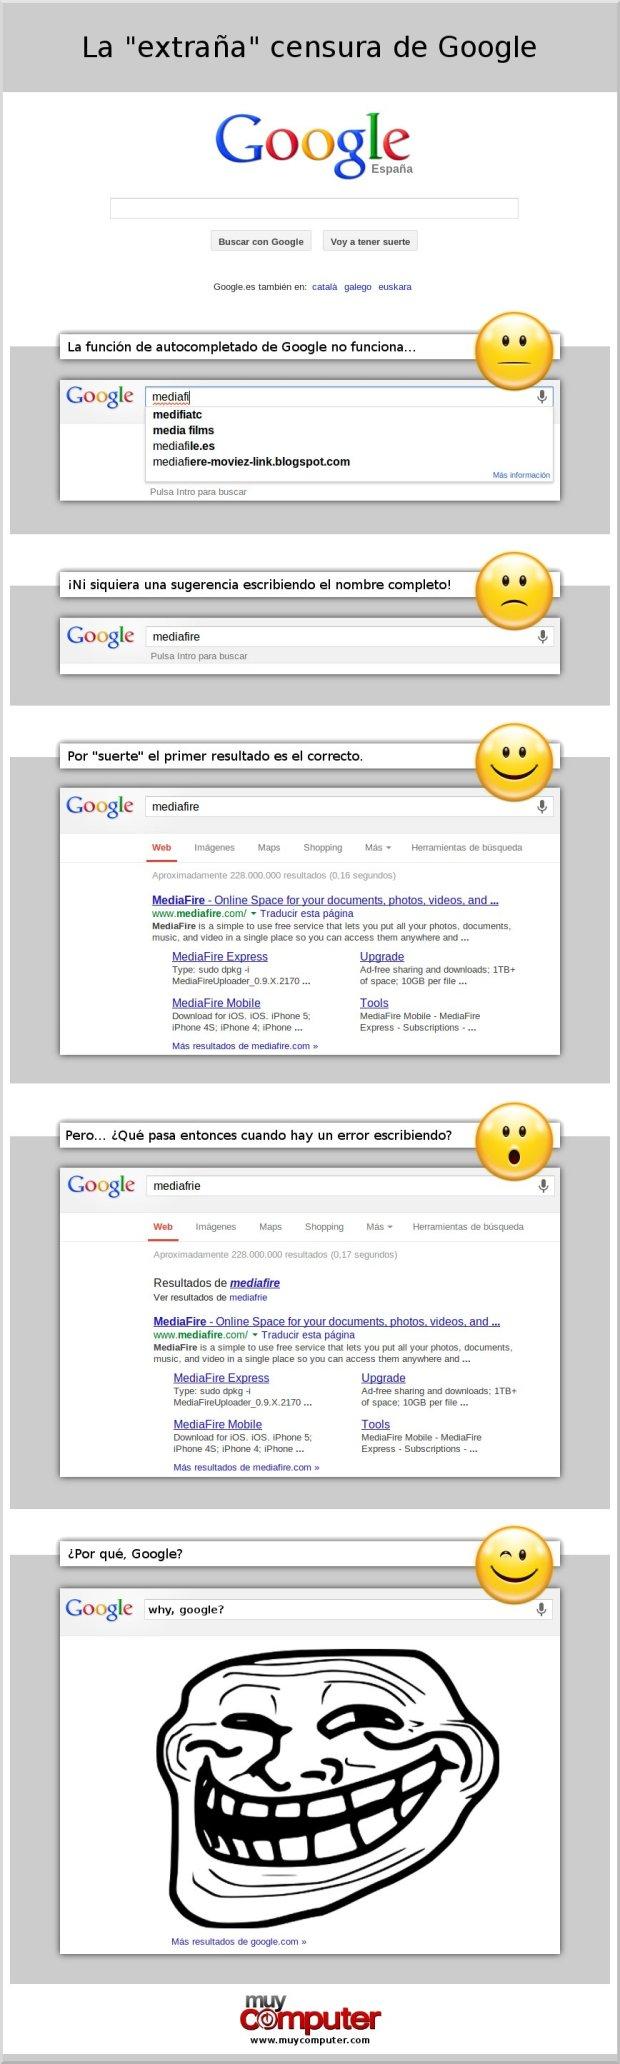 http://www.muycomputer.com/2013/09/30/la-extrana-censura-de-google-infografia?utm_source=feedly